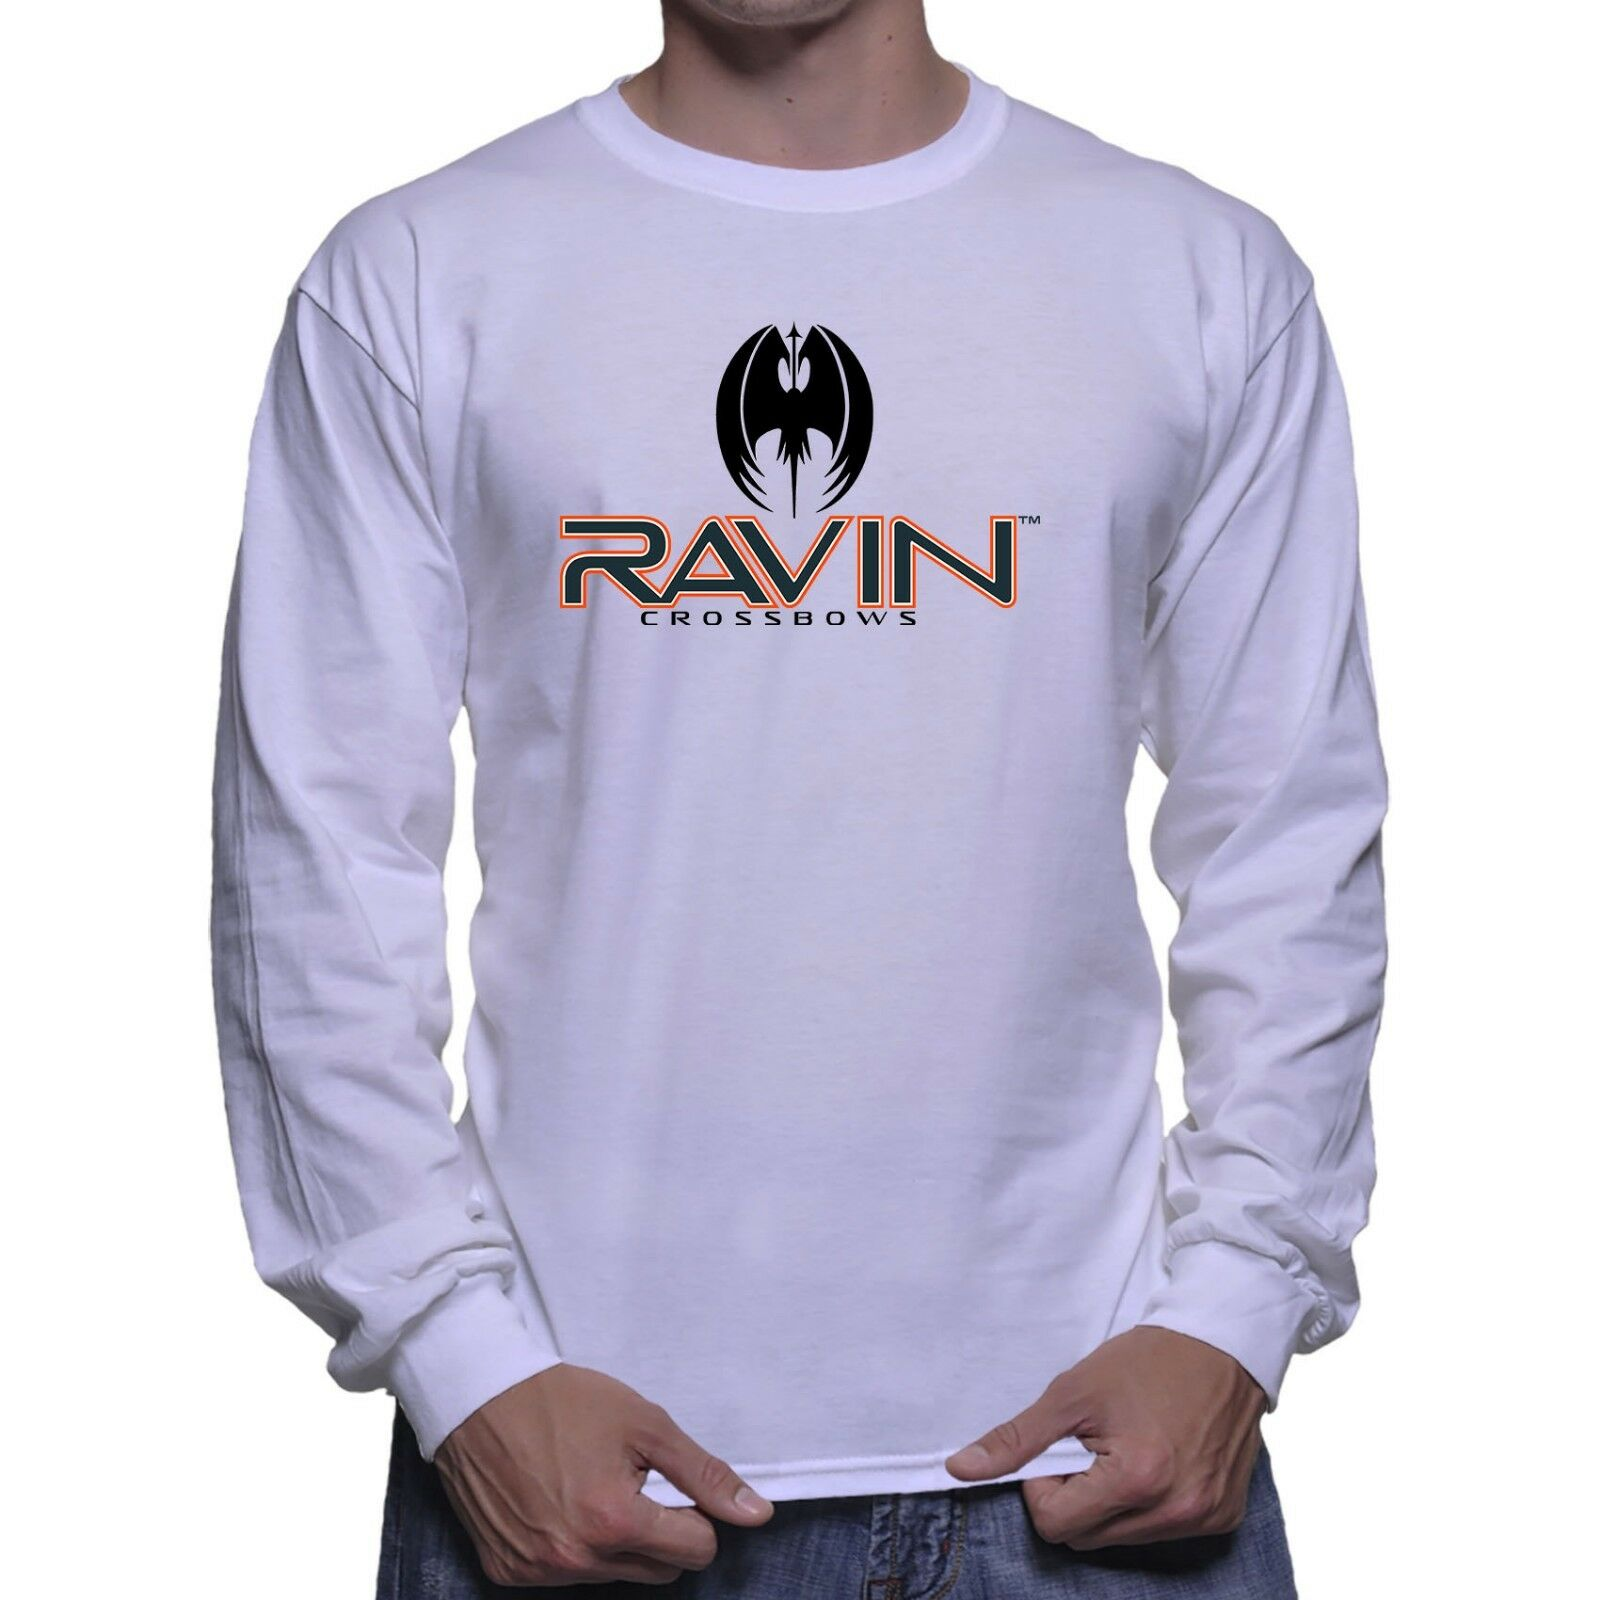 Ravin Crossbow Deer Hunting Long Sleeve White T-shirt Size S